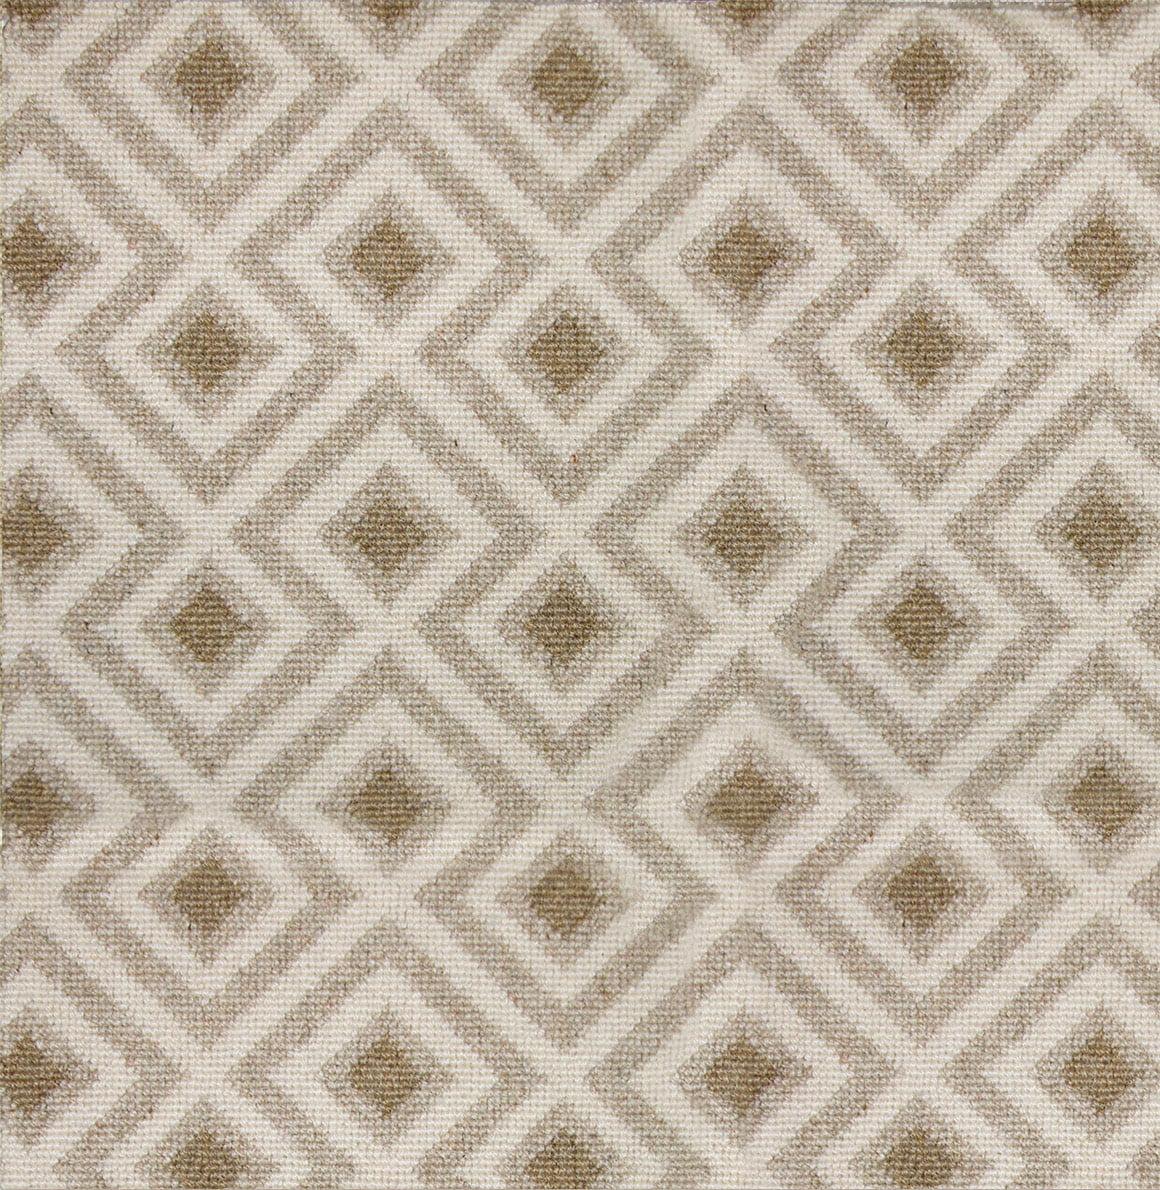 Buy Fiorentina by Prestige Pattern Wool